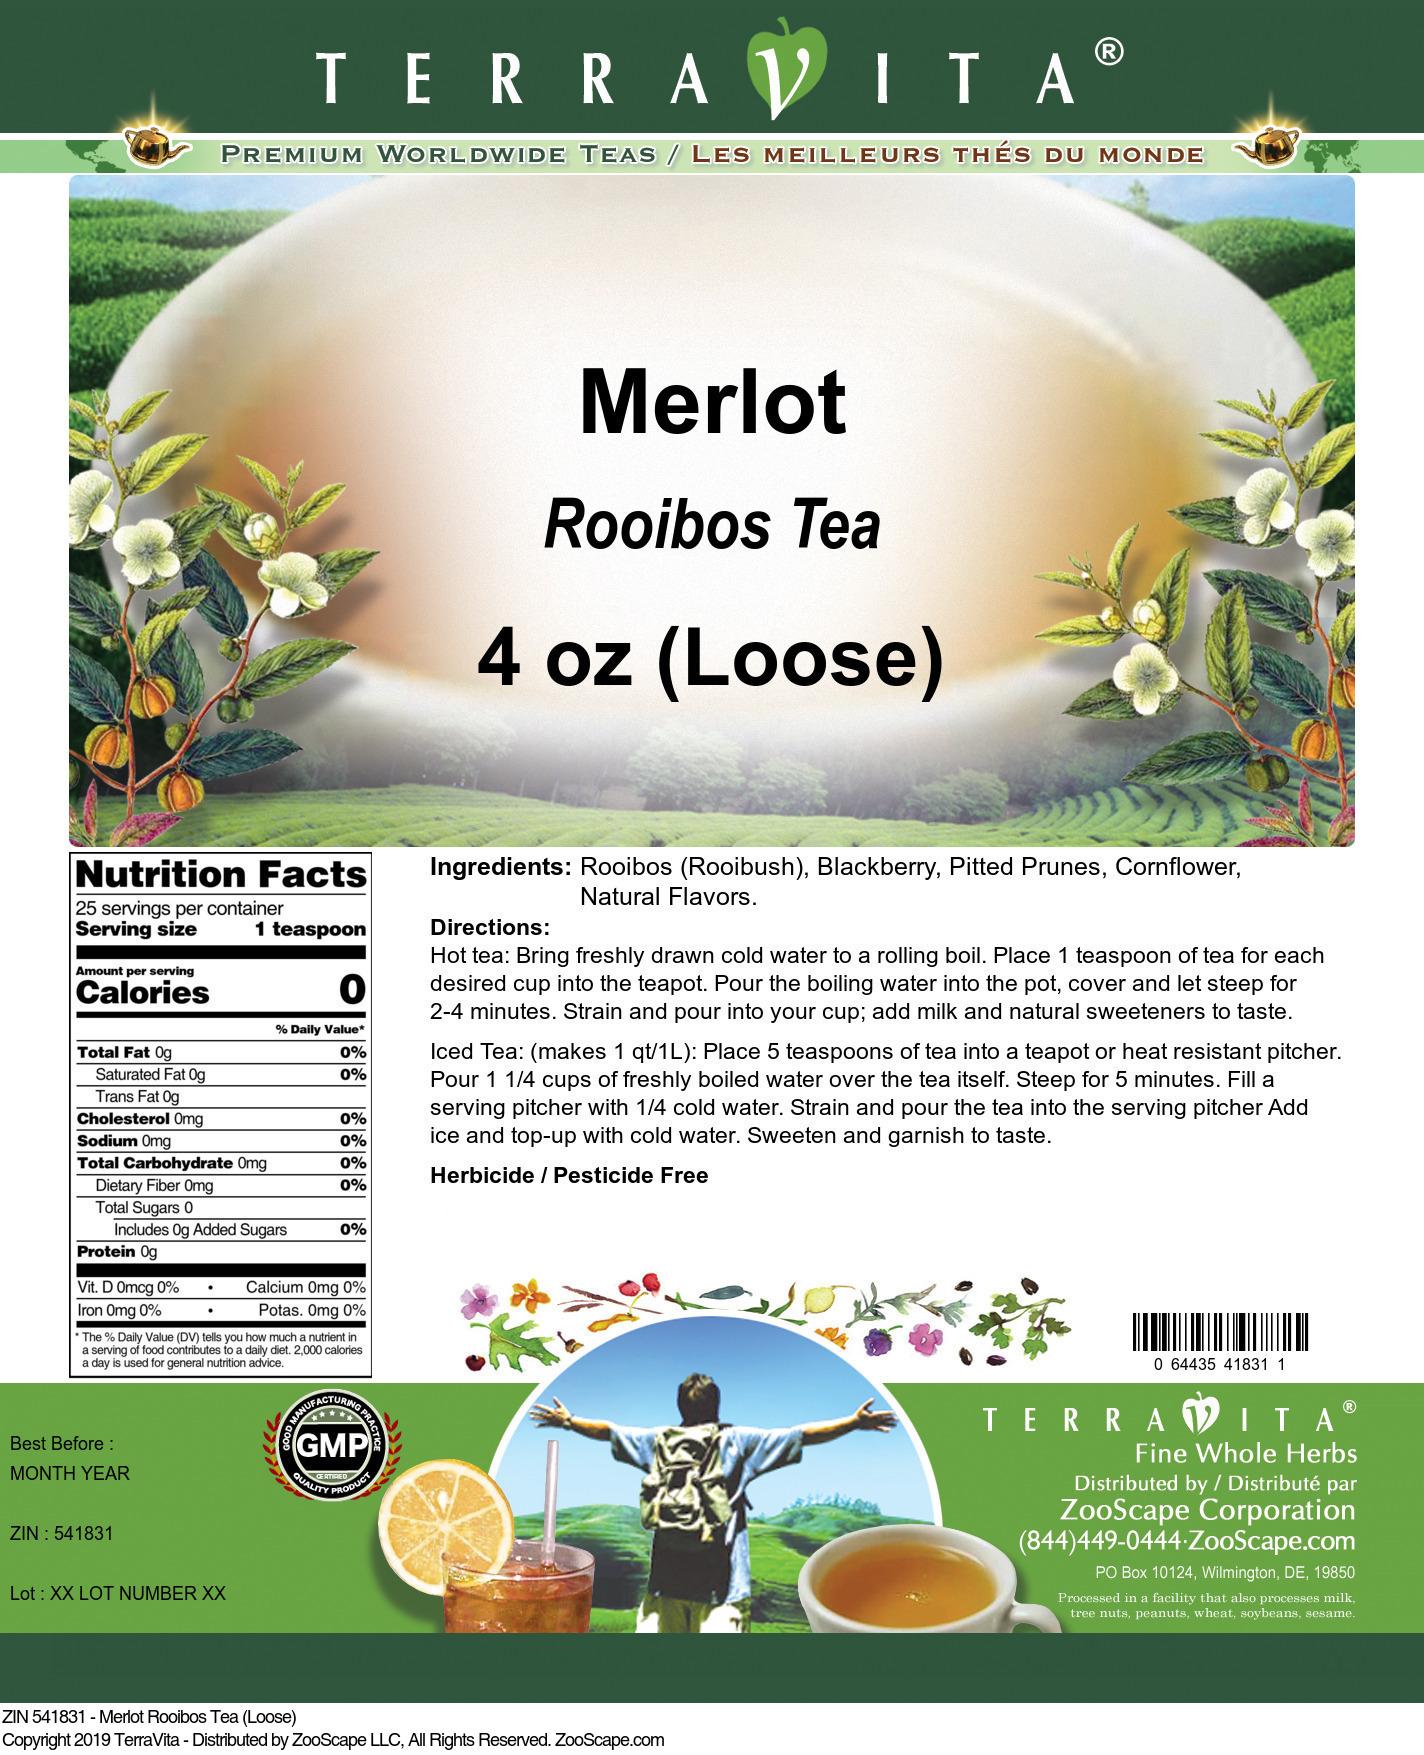 Merlot Rooibos Tea (Loose)